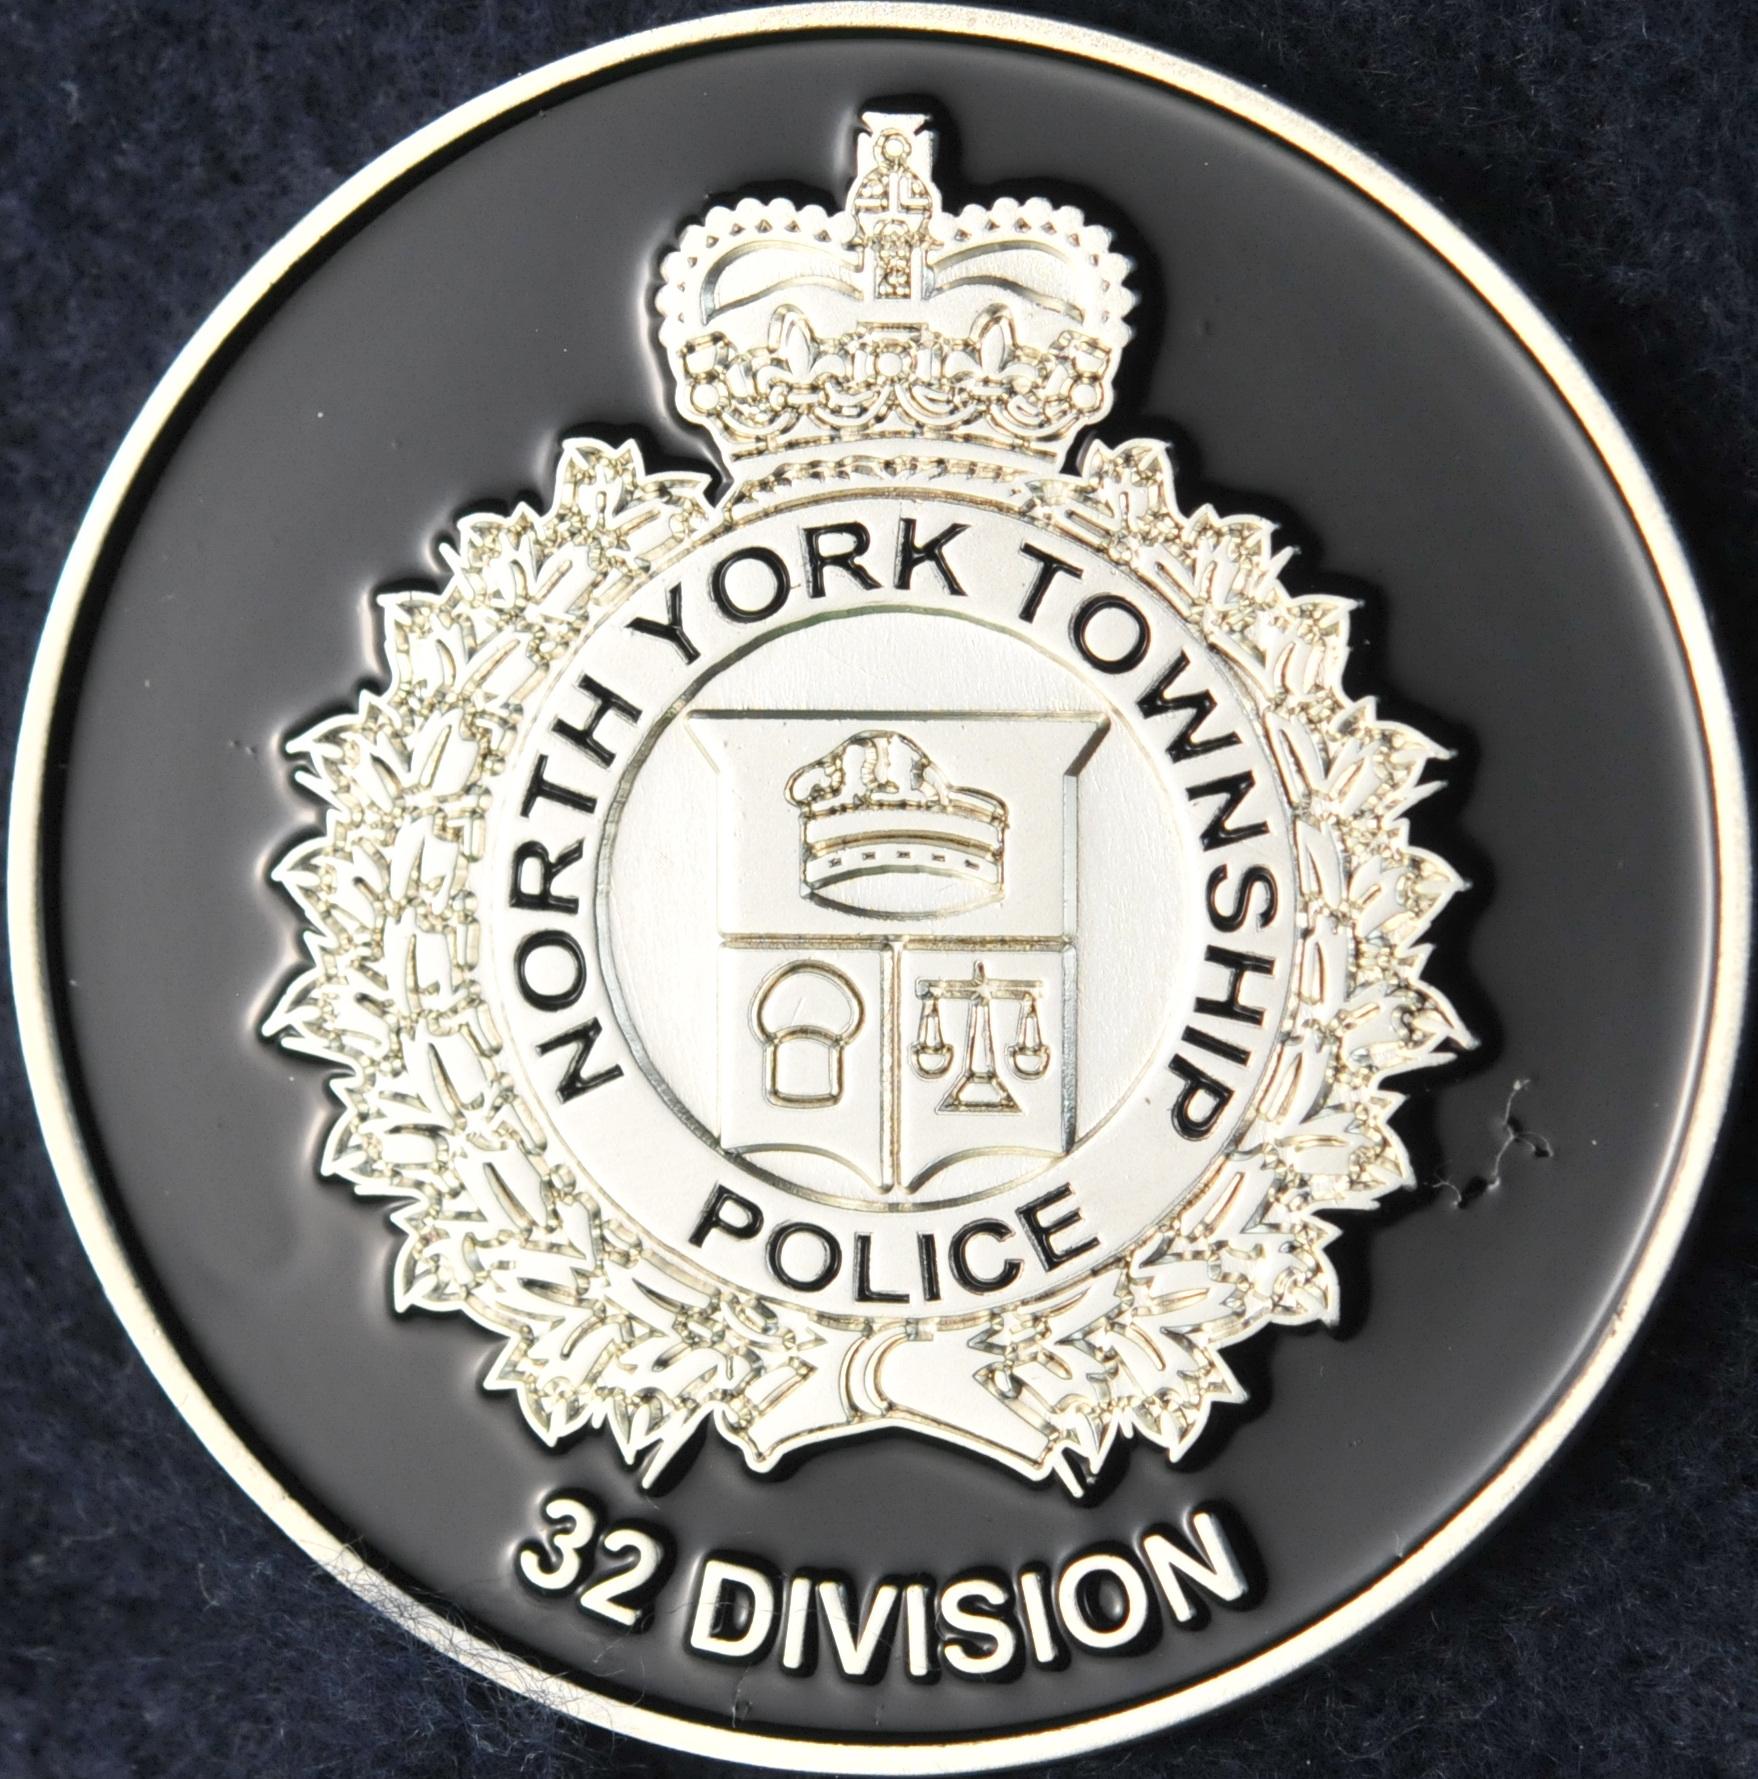 Toronto Police Service North York Township 32 Division Challengecoins Ca